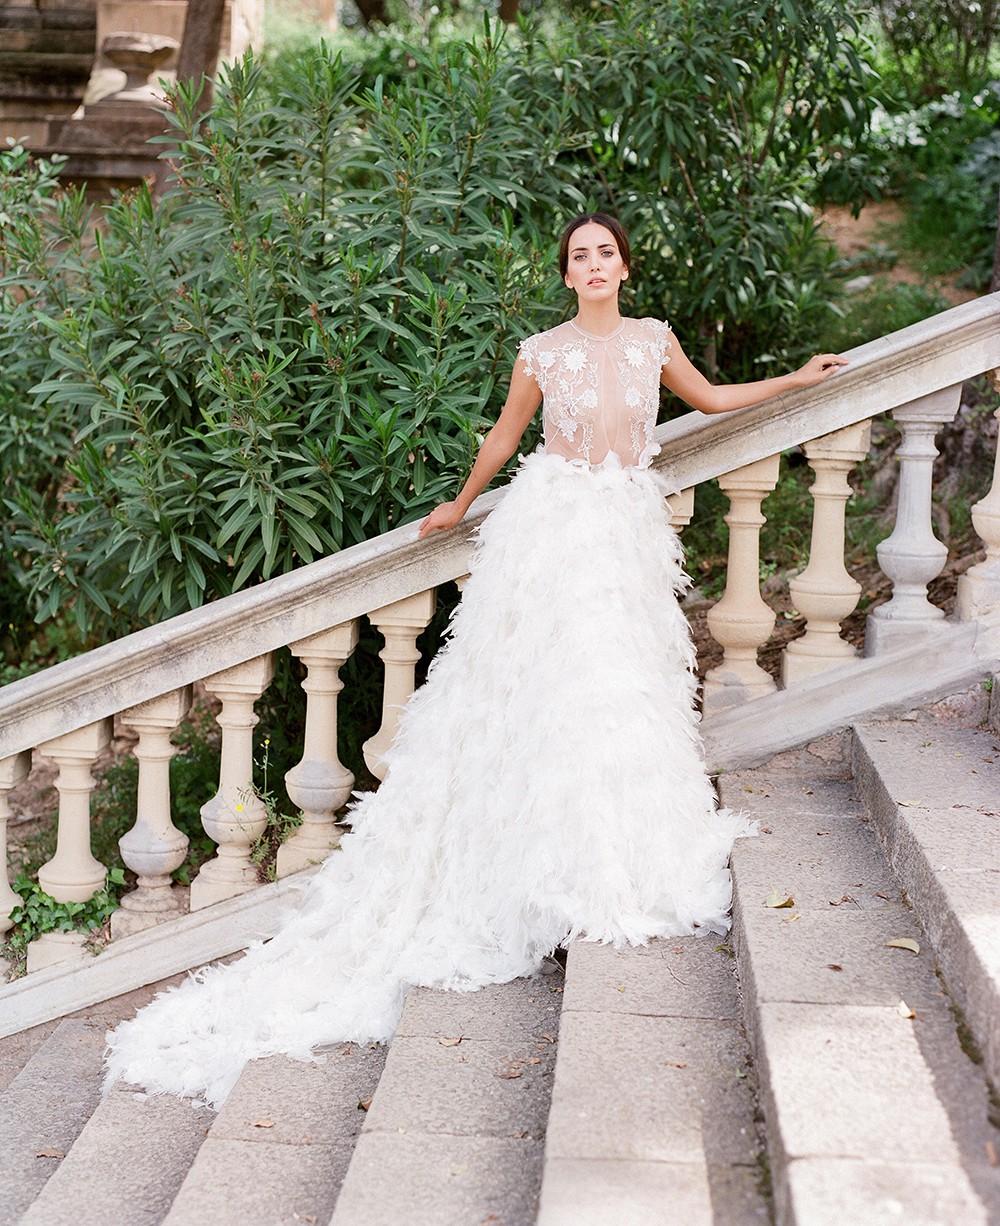 Marco   Maria Bridal Gowns 2019 collection. Τα νυφικά του ισπανικού οίκου  που θα λατρέψετε. 831027416ee